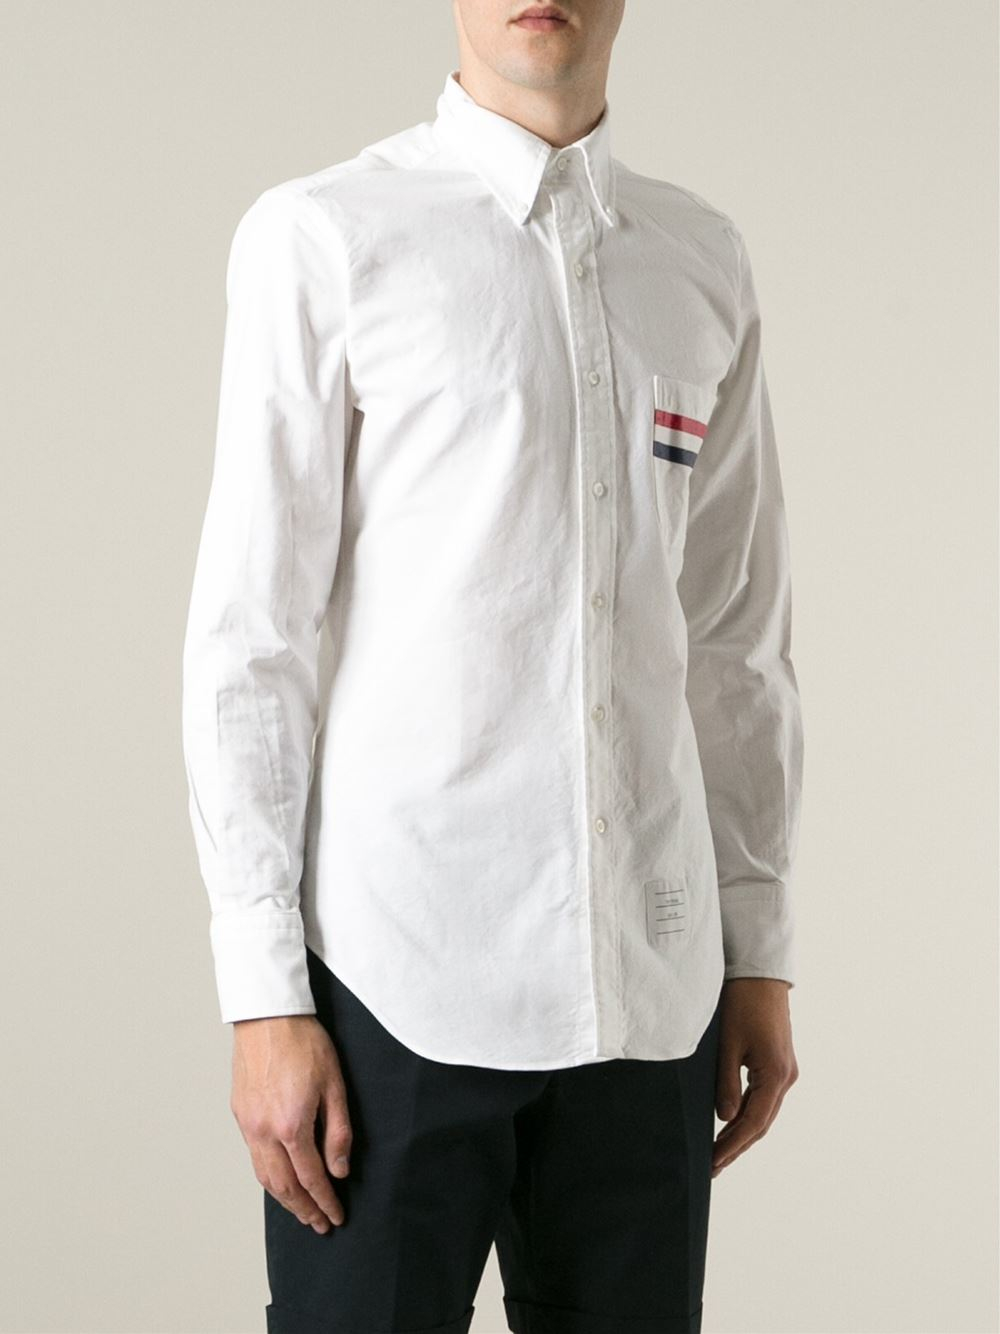 Thom browne pocket stripes detail shirt in white for men for Thom browne white shirt